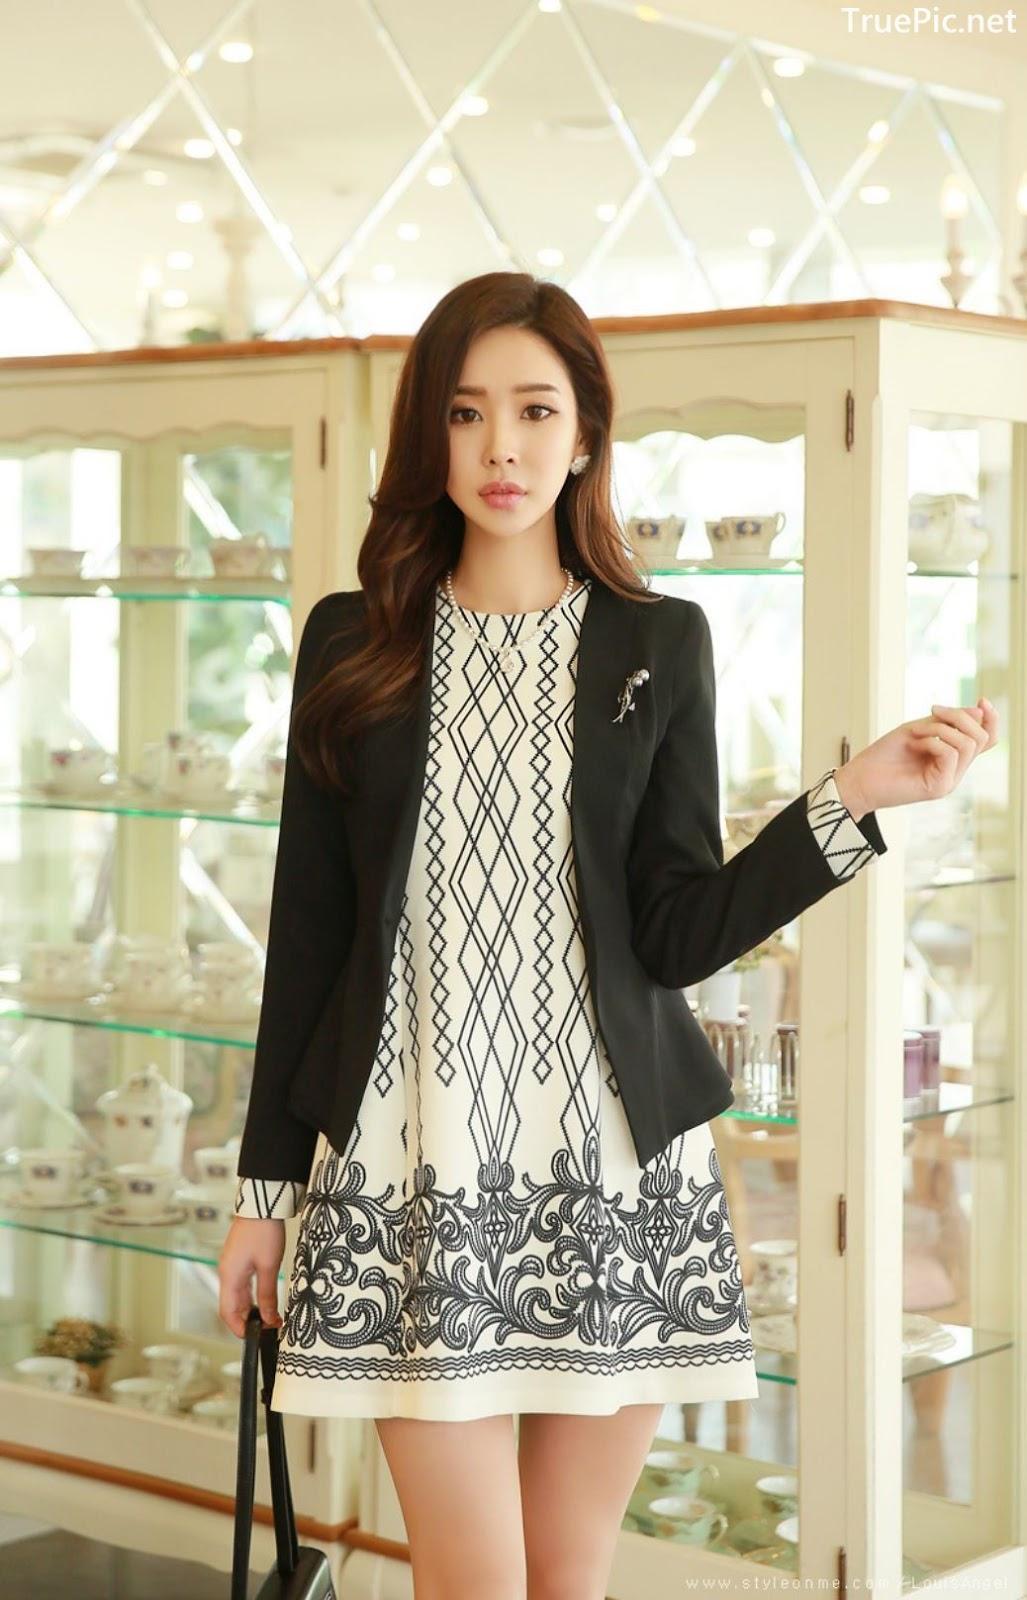 Image-Korean-Fashion-Model-Park-Da-Hyun-Office-Dress-Collection-TruePic.net- Picture-1